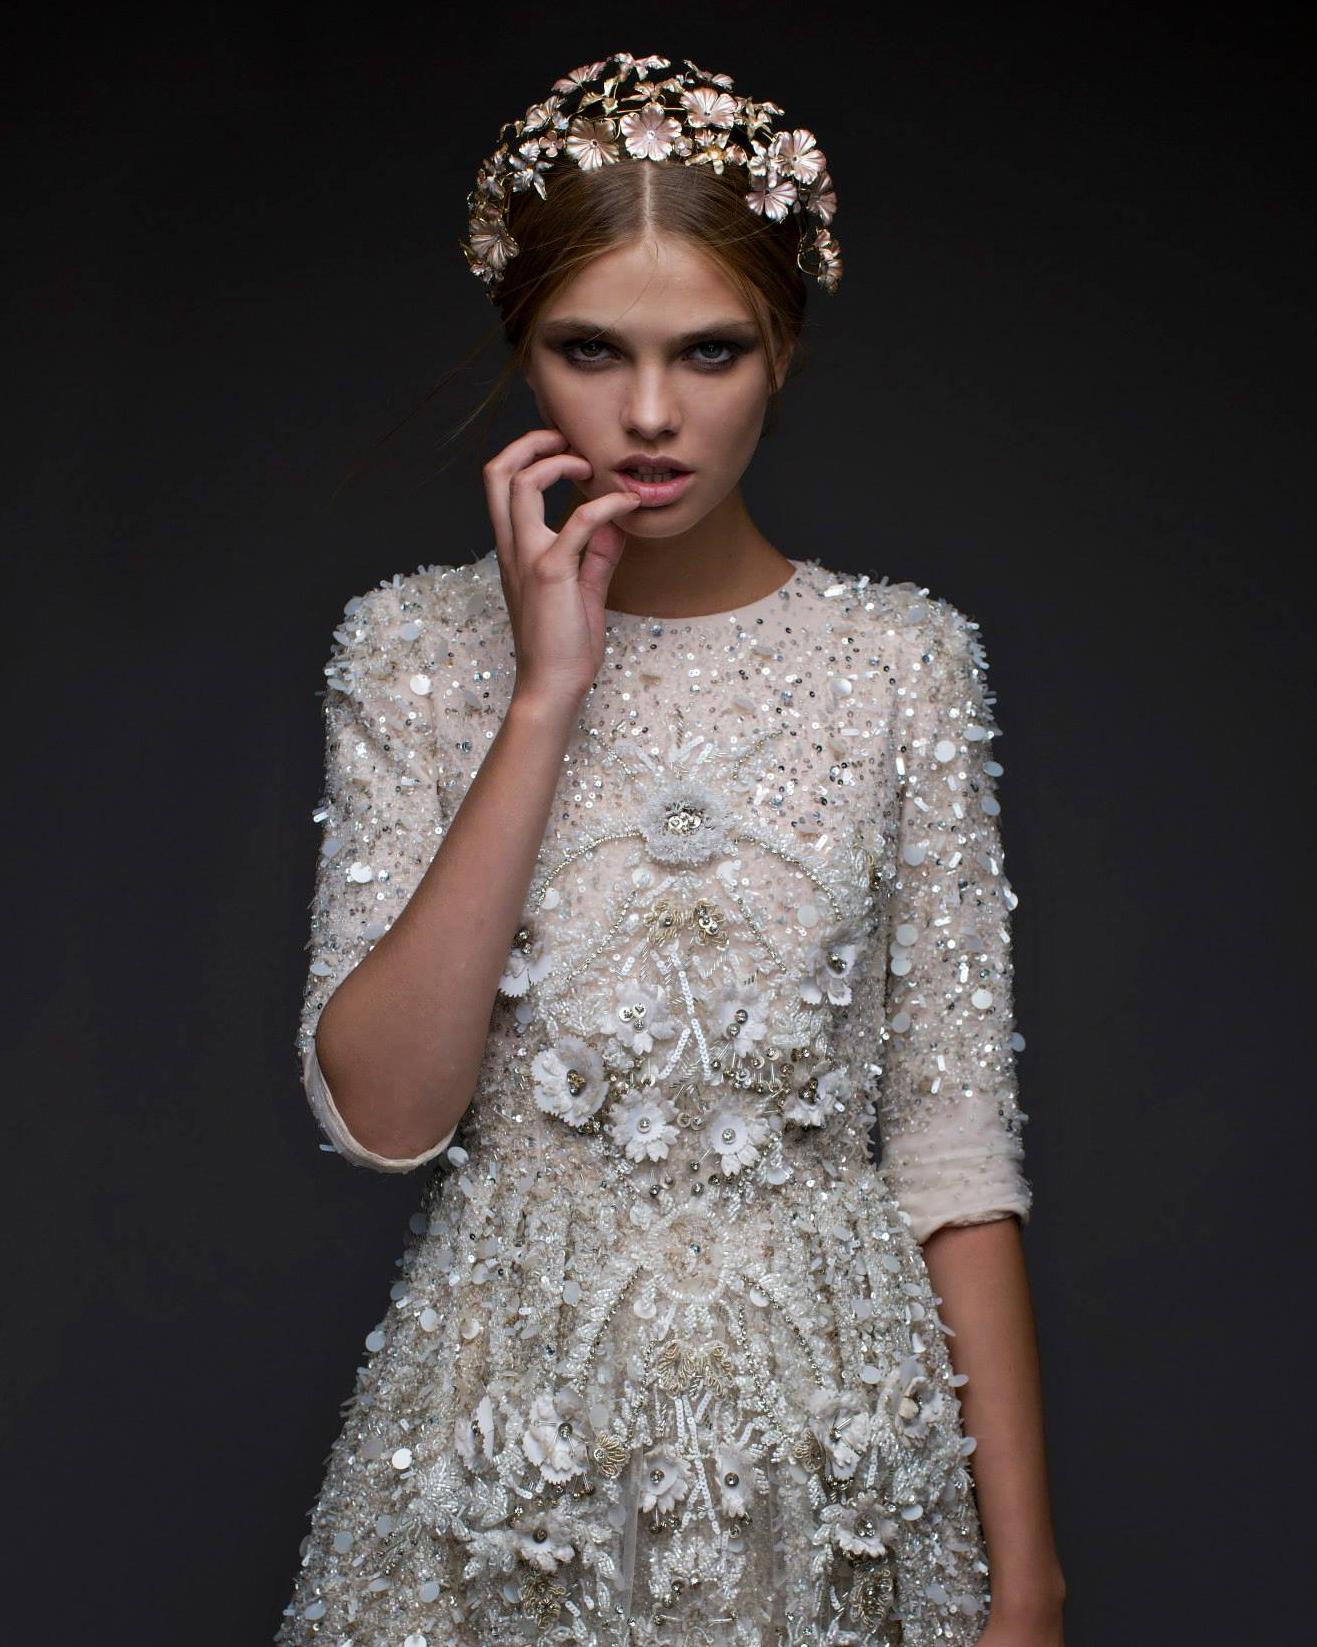 the-lane-winter-bride-chana-marelus-gown-0116.jpg